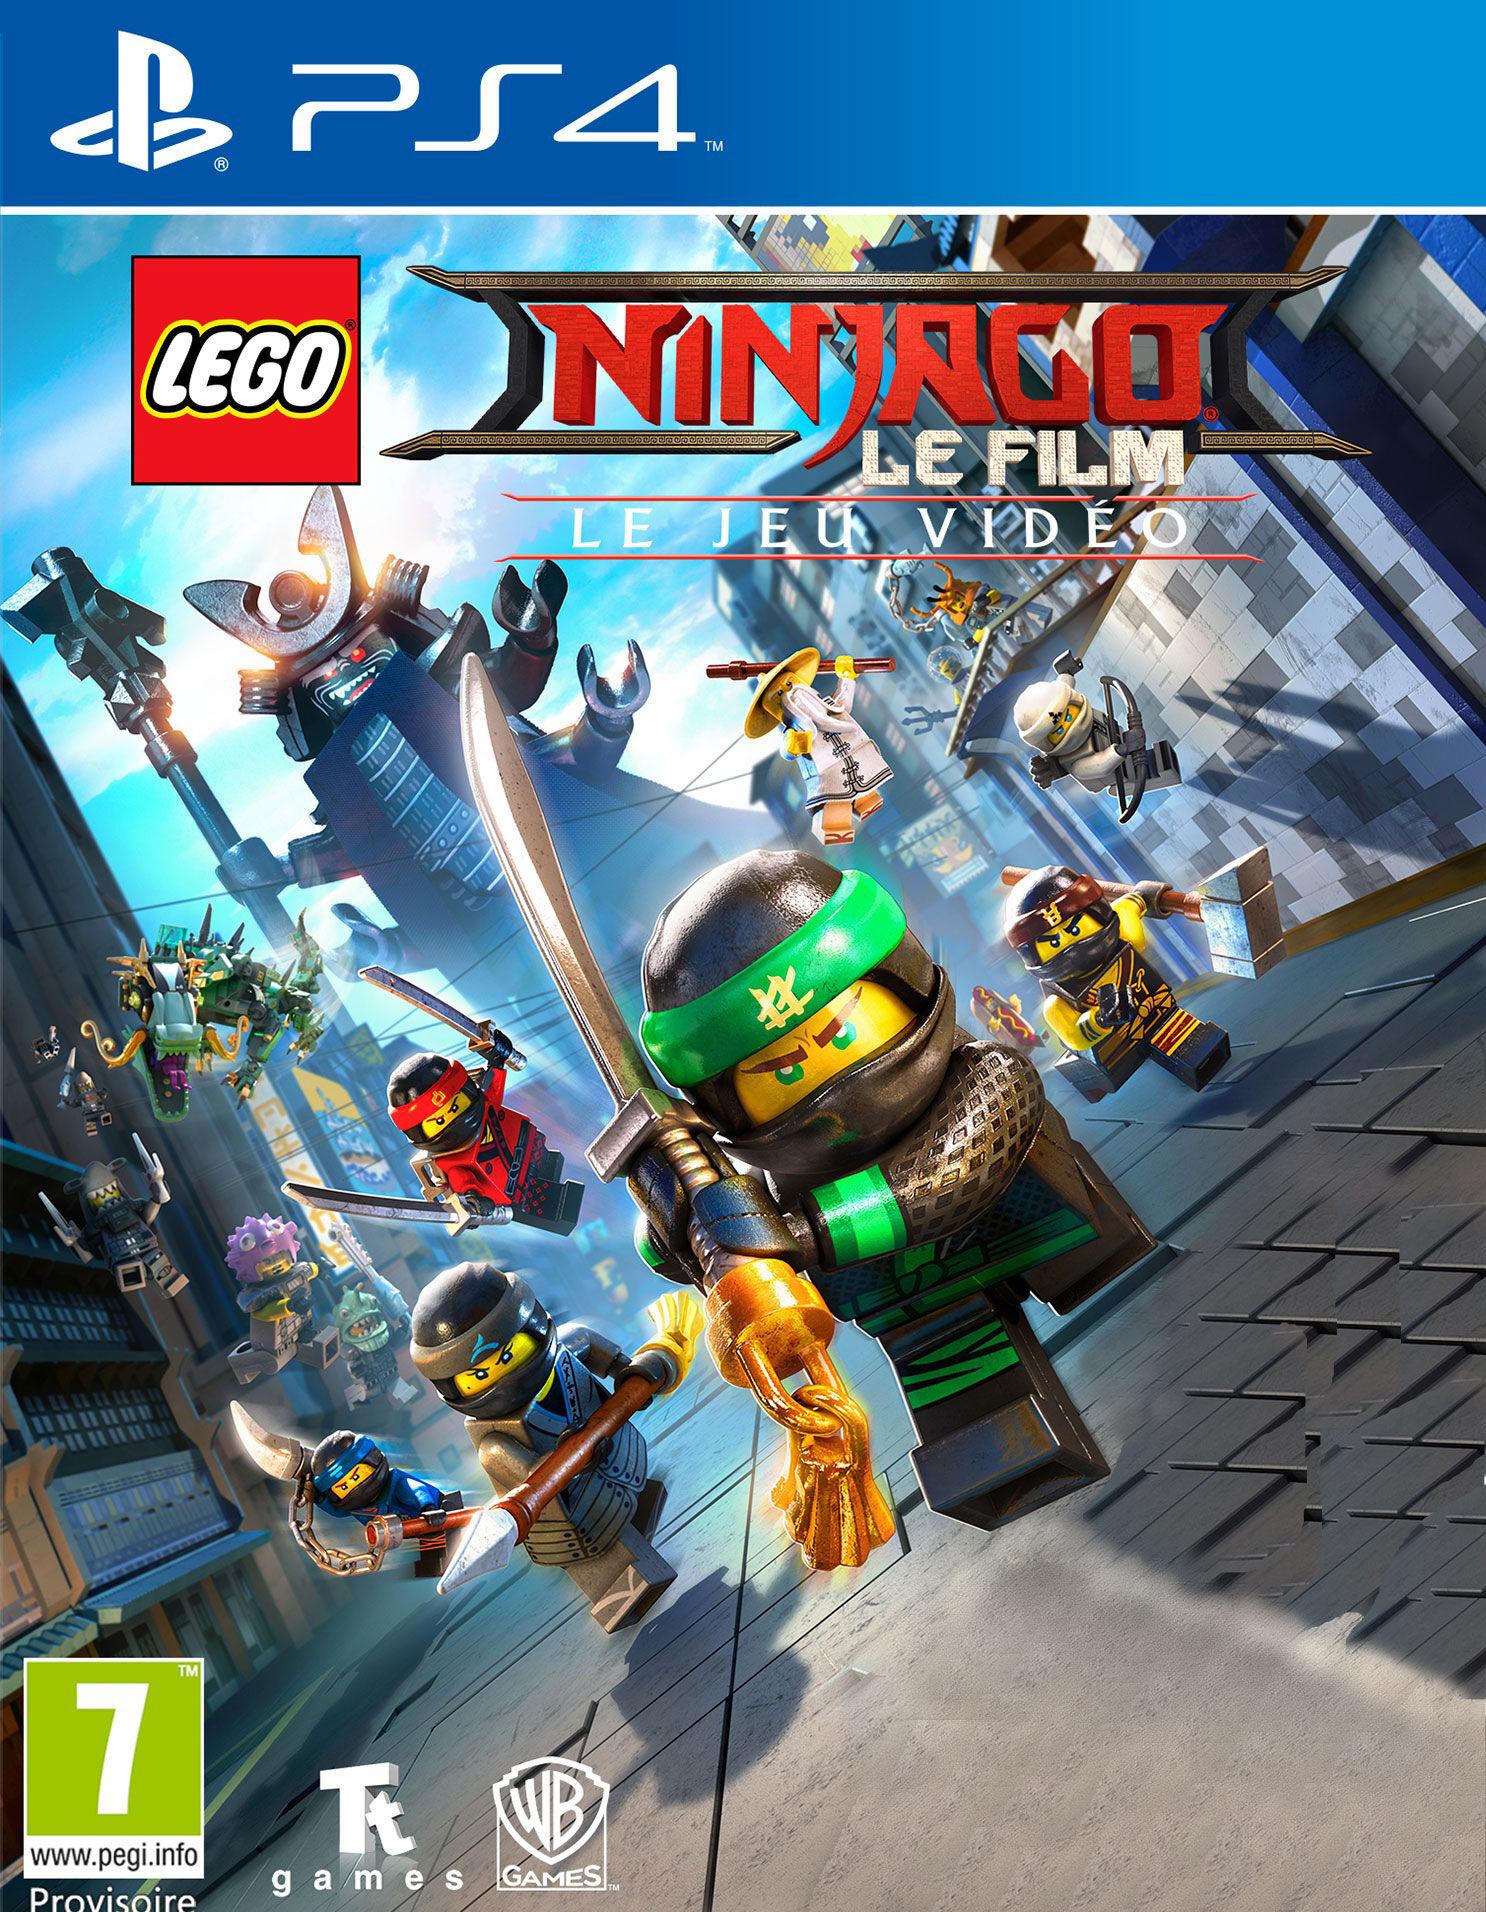 Jeux De Jeux De Ninjago : ninjago, Ninjago, Film:, Vidéo, Micromania